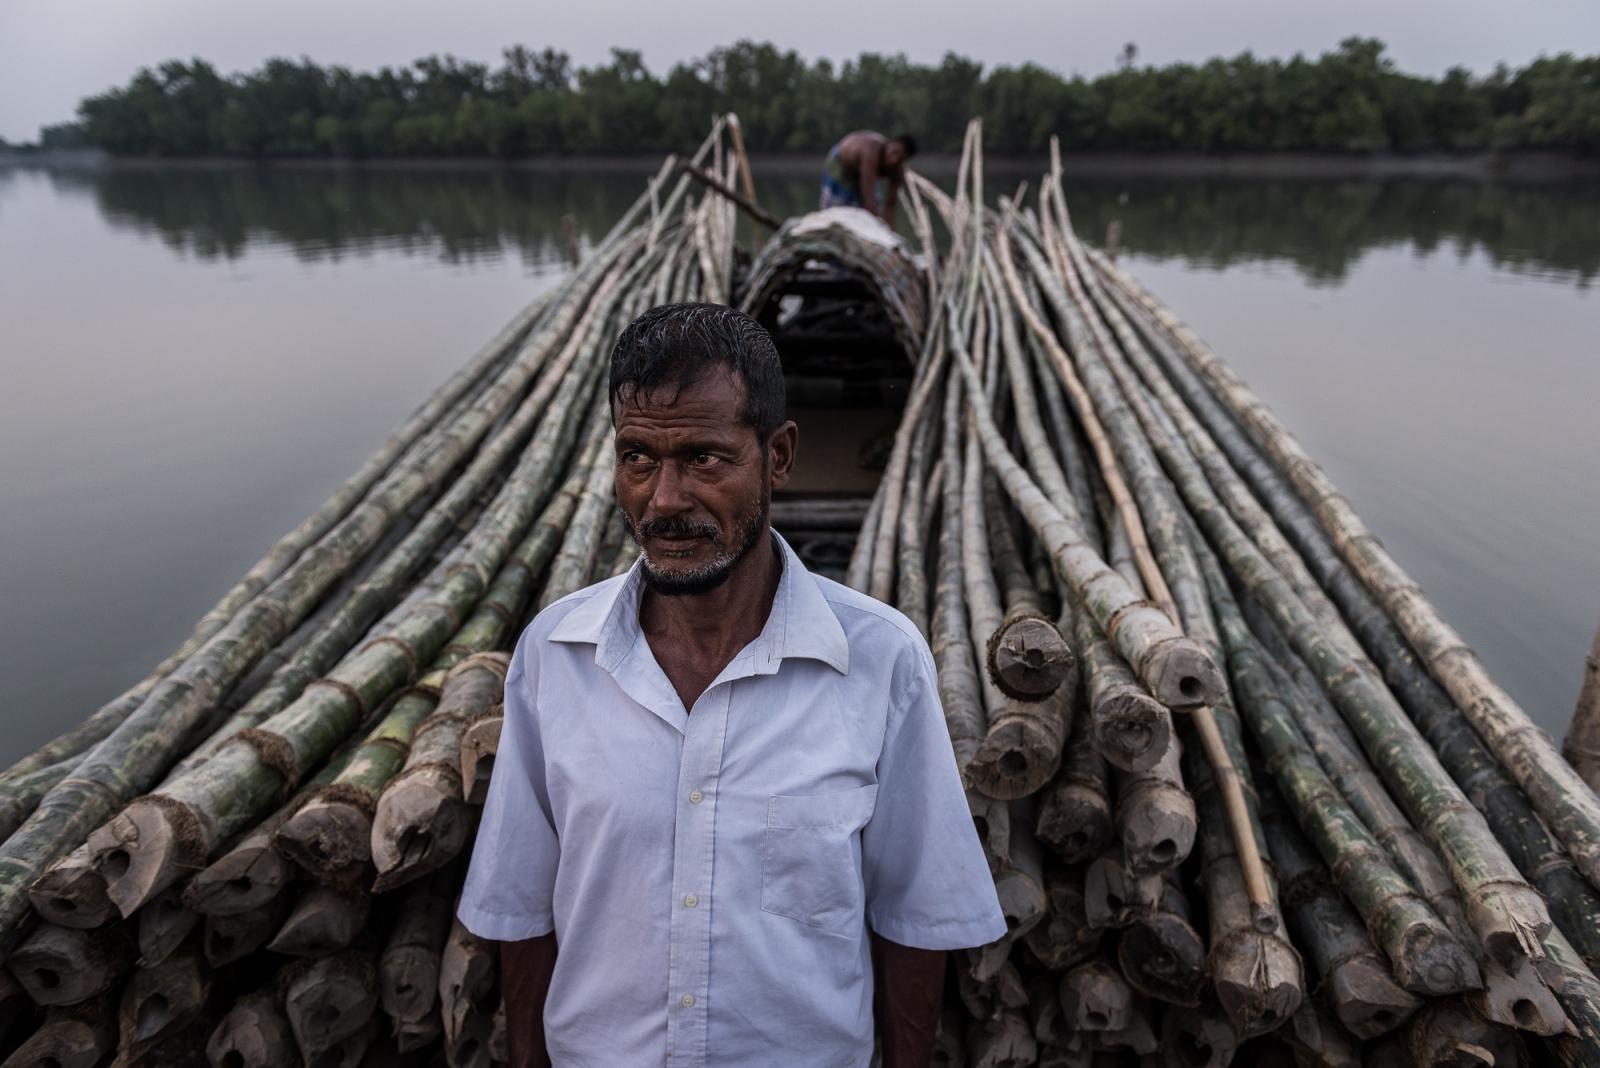 Art and Documentary Photography - Loading Climate_changed_-_Ignacio_Marin-7.jpg